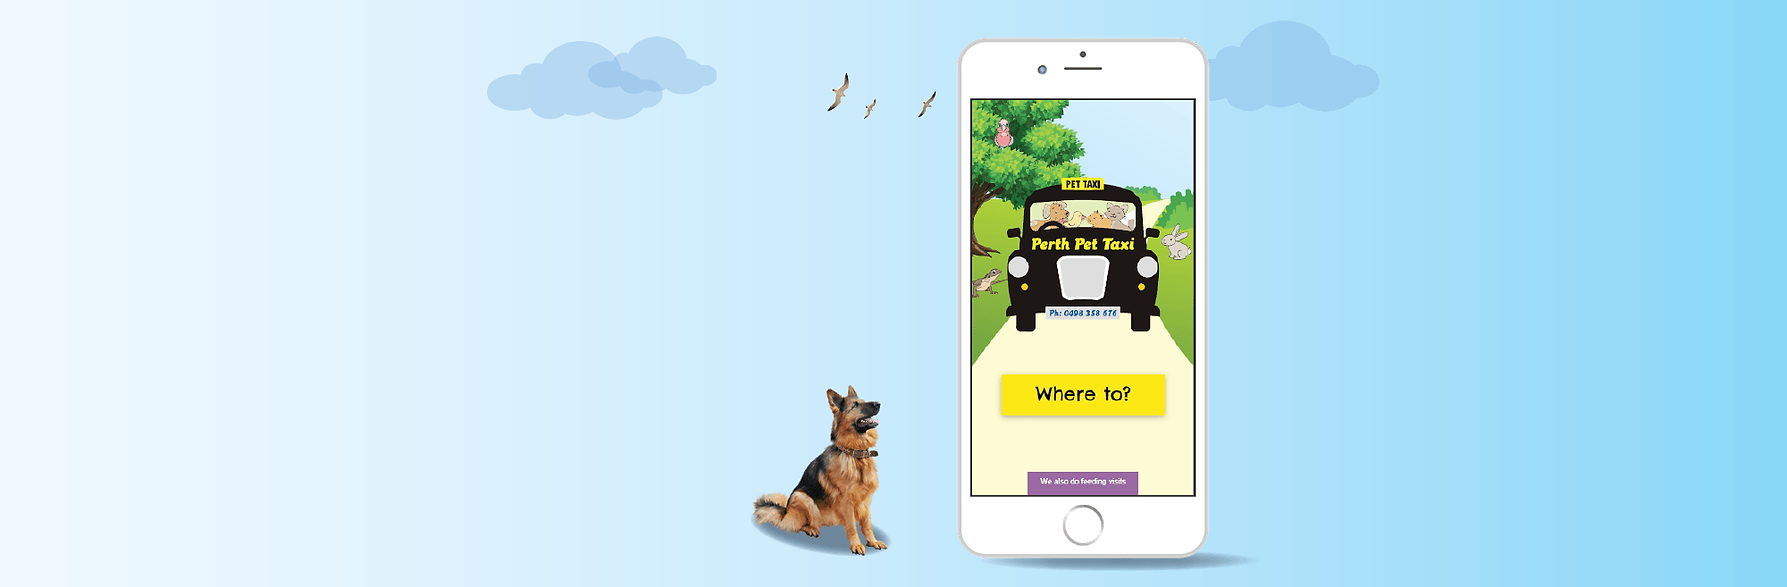 New-app-launch-website-banner2-8.png